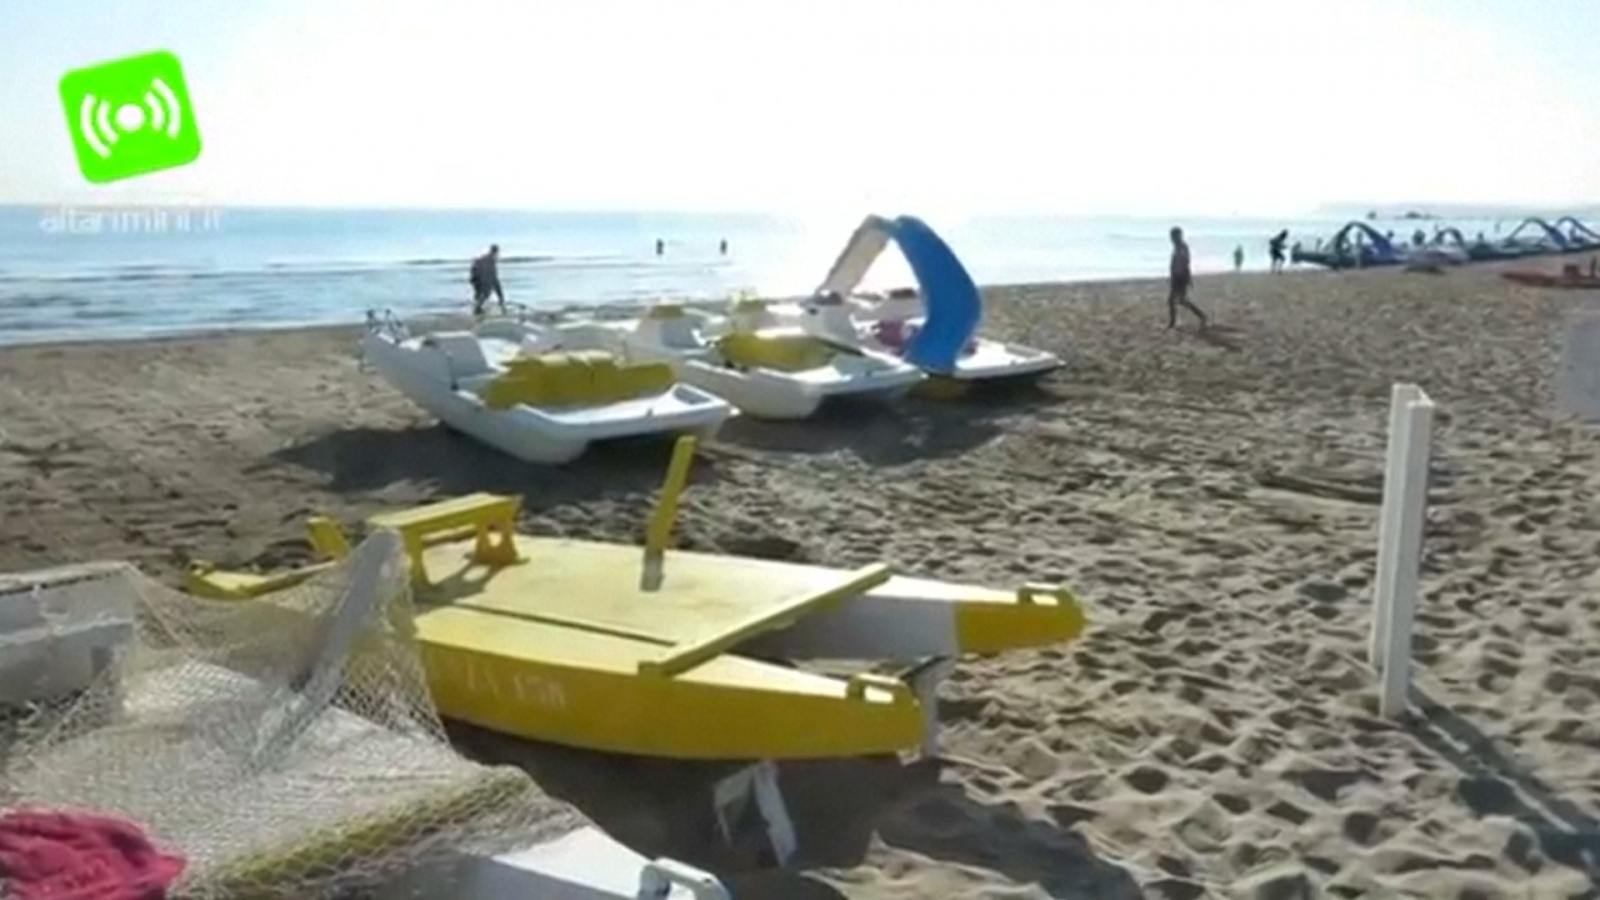 polish-woman-gang-raped-on-beach-in-italy